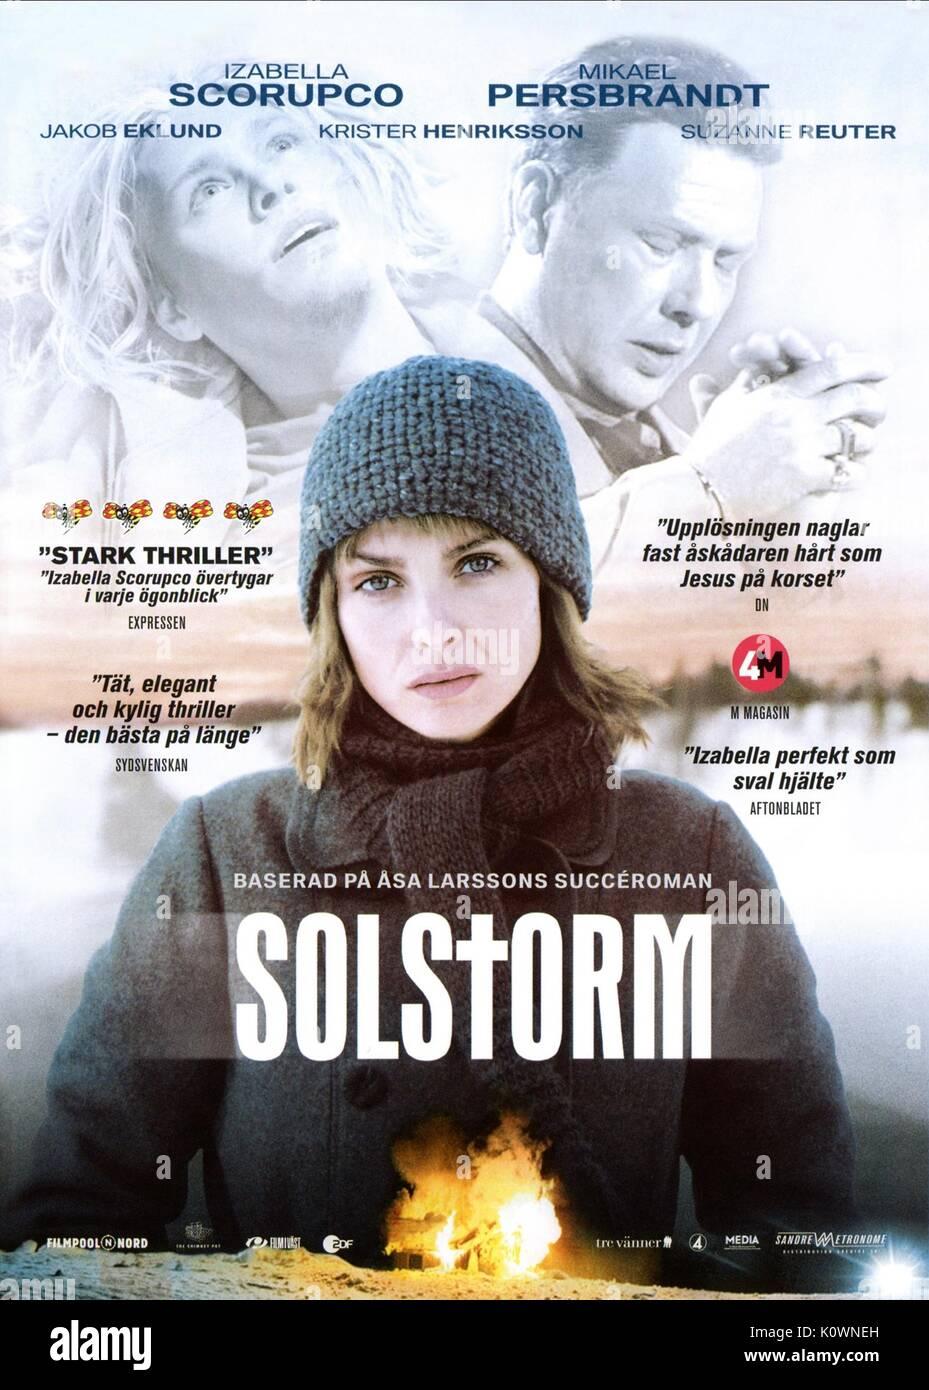 IZABELLA SCORUPCO SOLSTORM (2007) - Stock Image